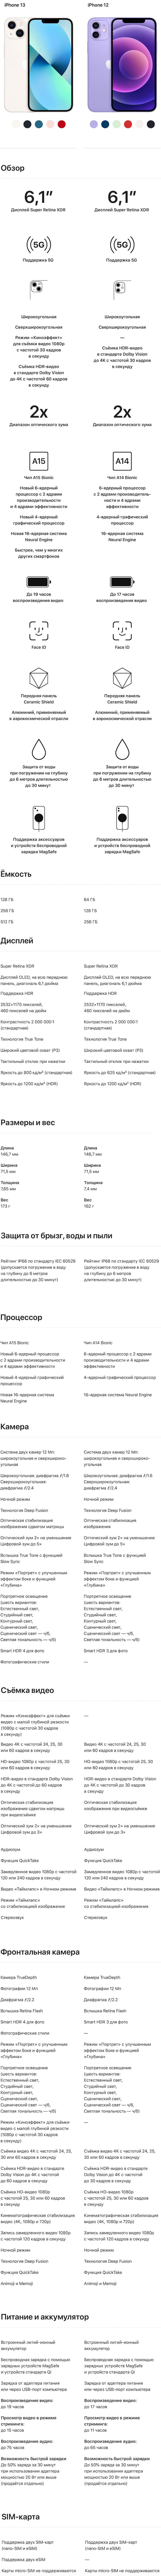 Подробное сравнение технических характеристик (спецификаций) iPhone 13 и iPhone 12